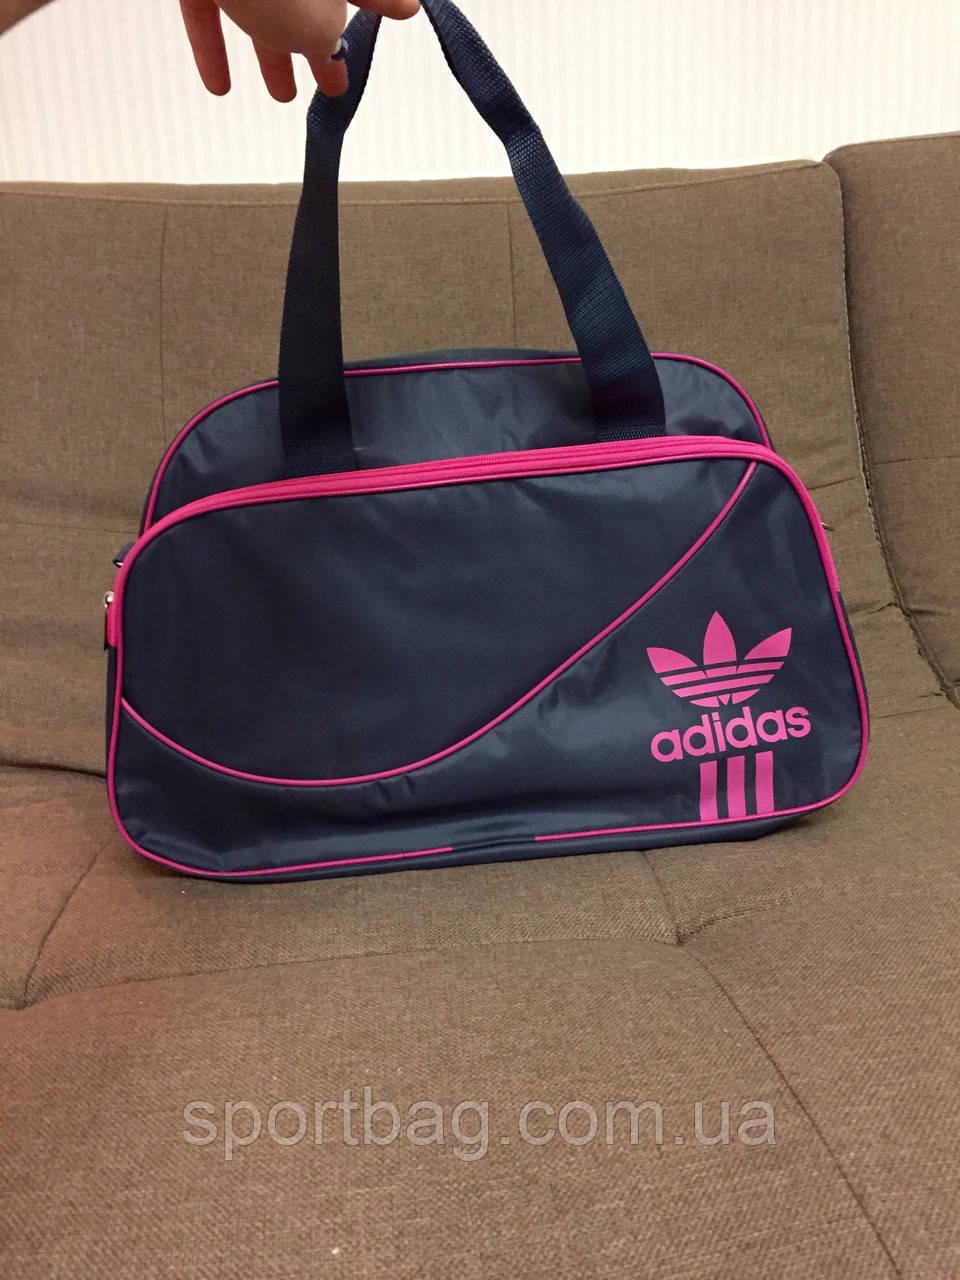 e57f57152735 Сумка спортивная Adidas БЖ (серый+голубой цвет), цена 200 грн., купить в  Харькове — Prom.ua (ID#75168623)